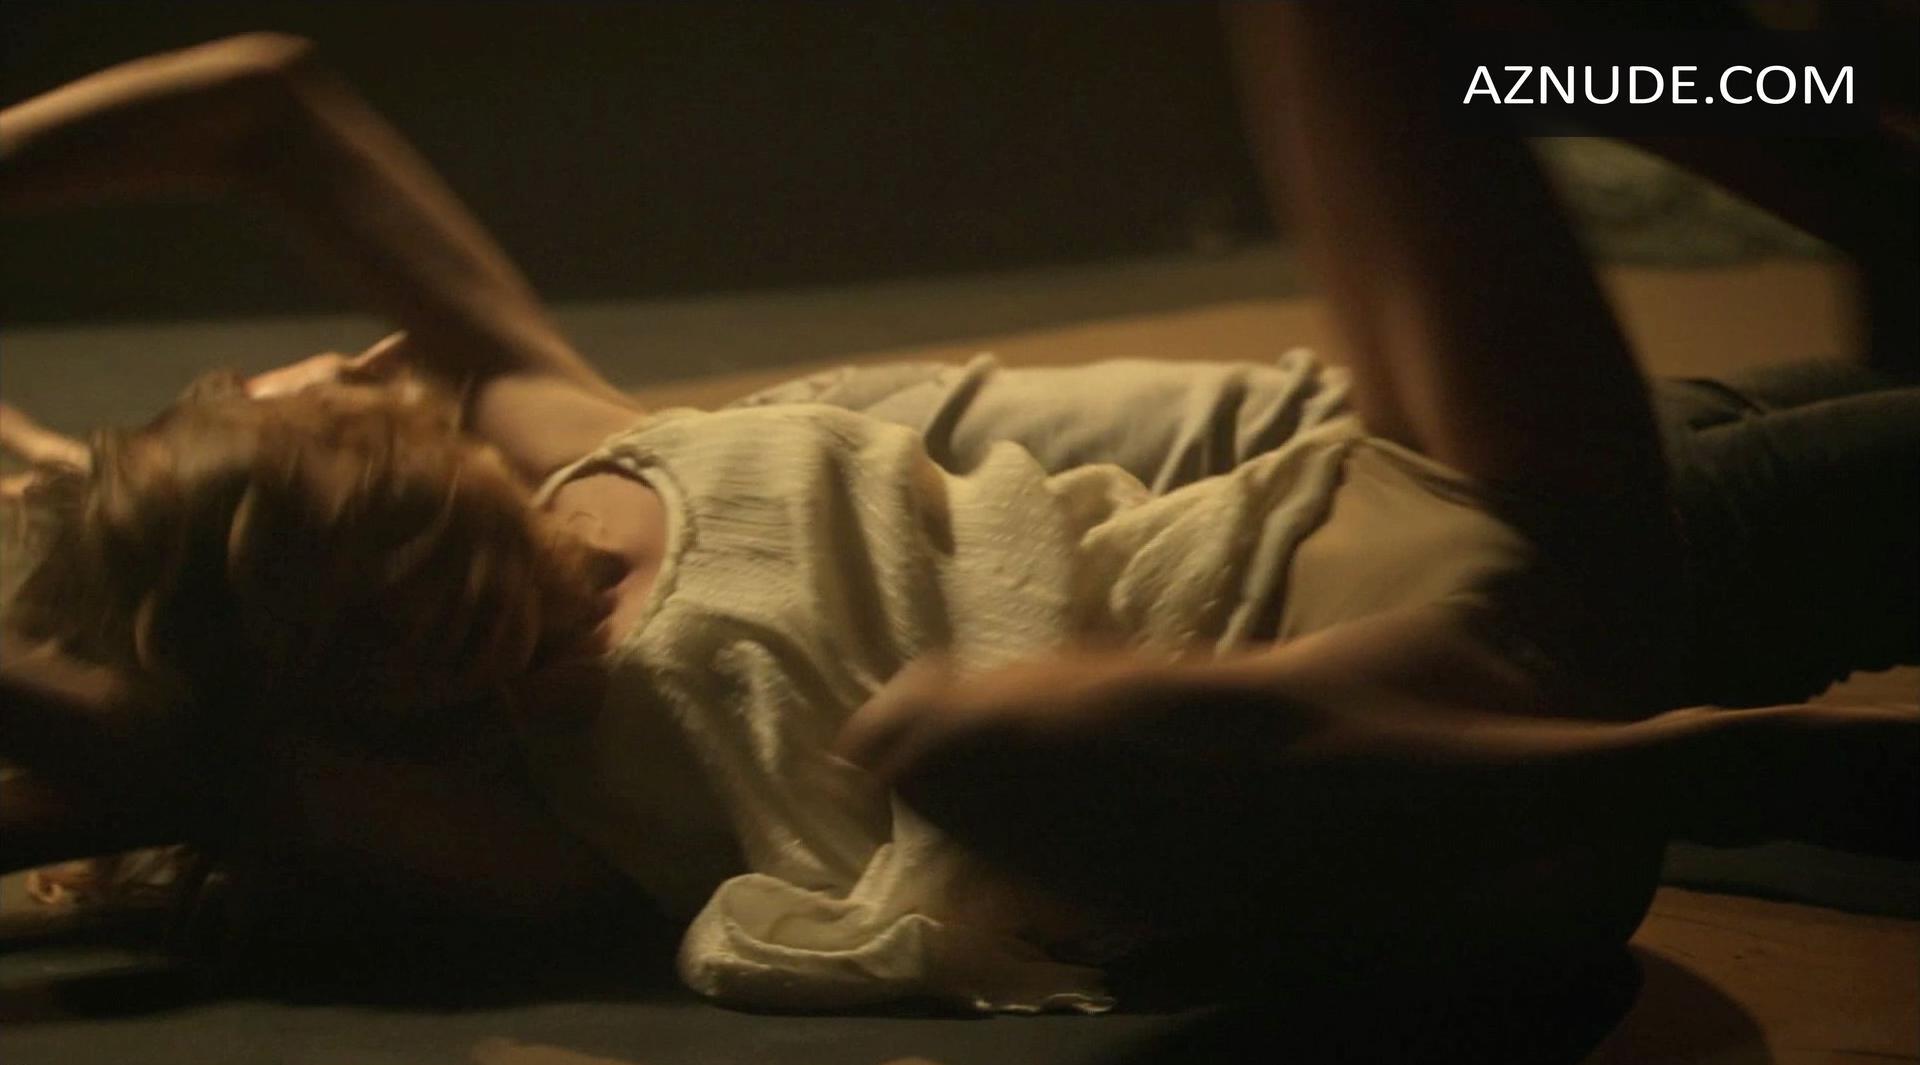 Monica bellucci sex in manuale damore scandalplanetcom - 3 8